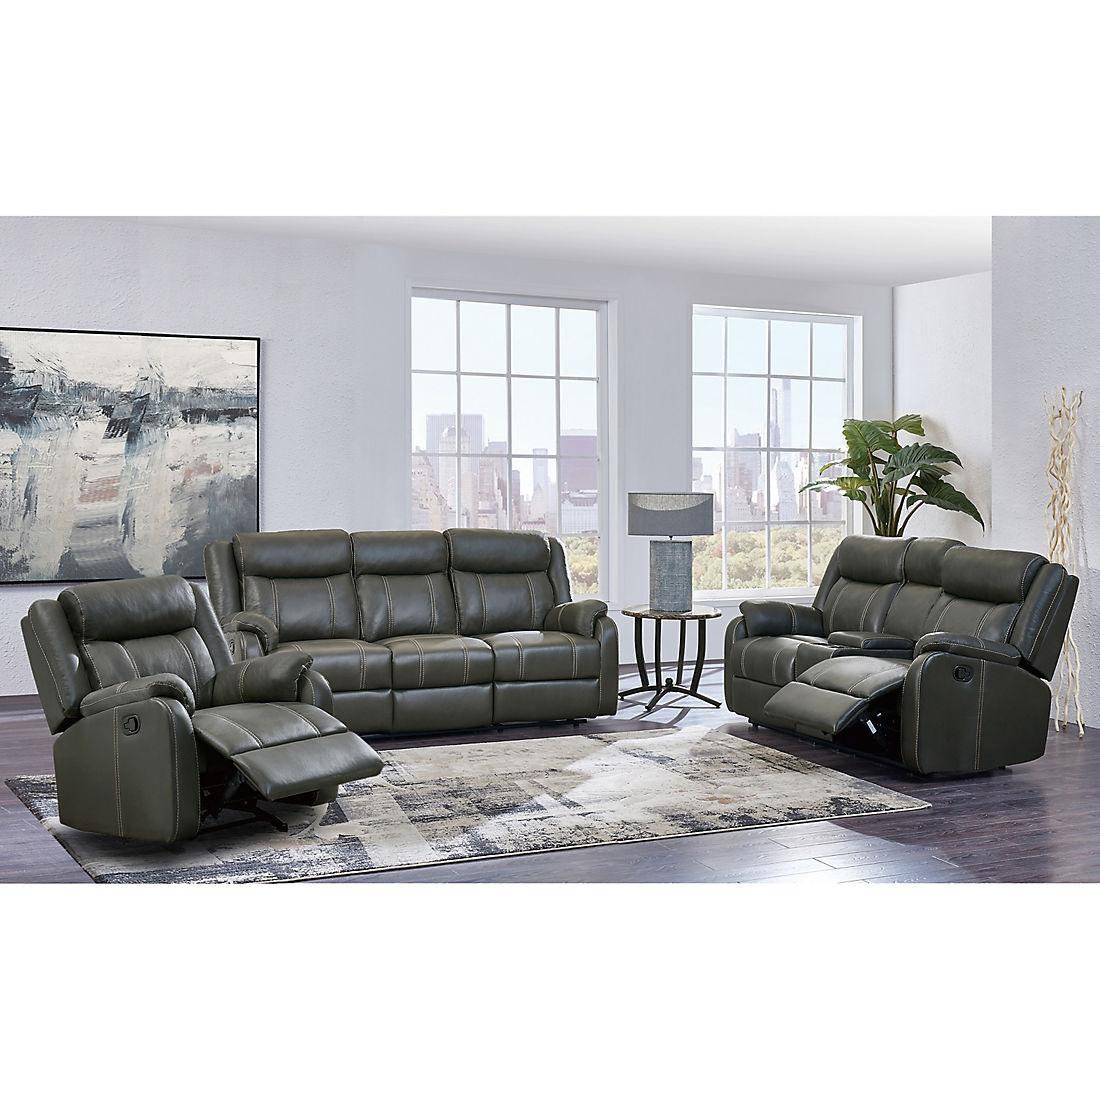 Carson 3 Pc Reclining Living Room Set Gray Bjs Wholesale Club